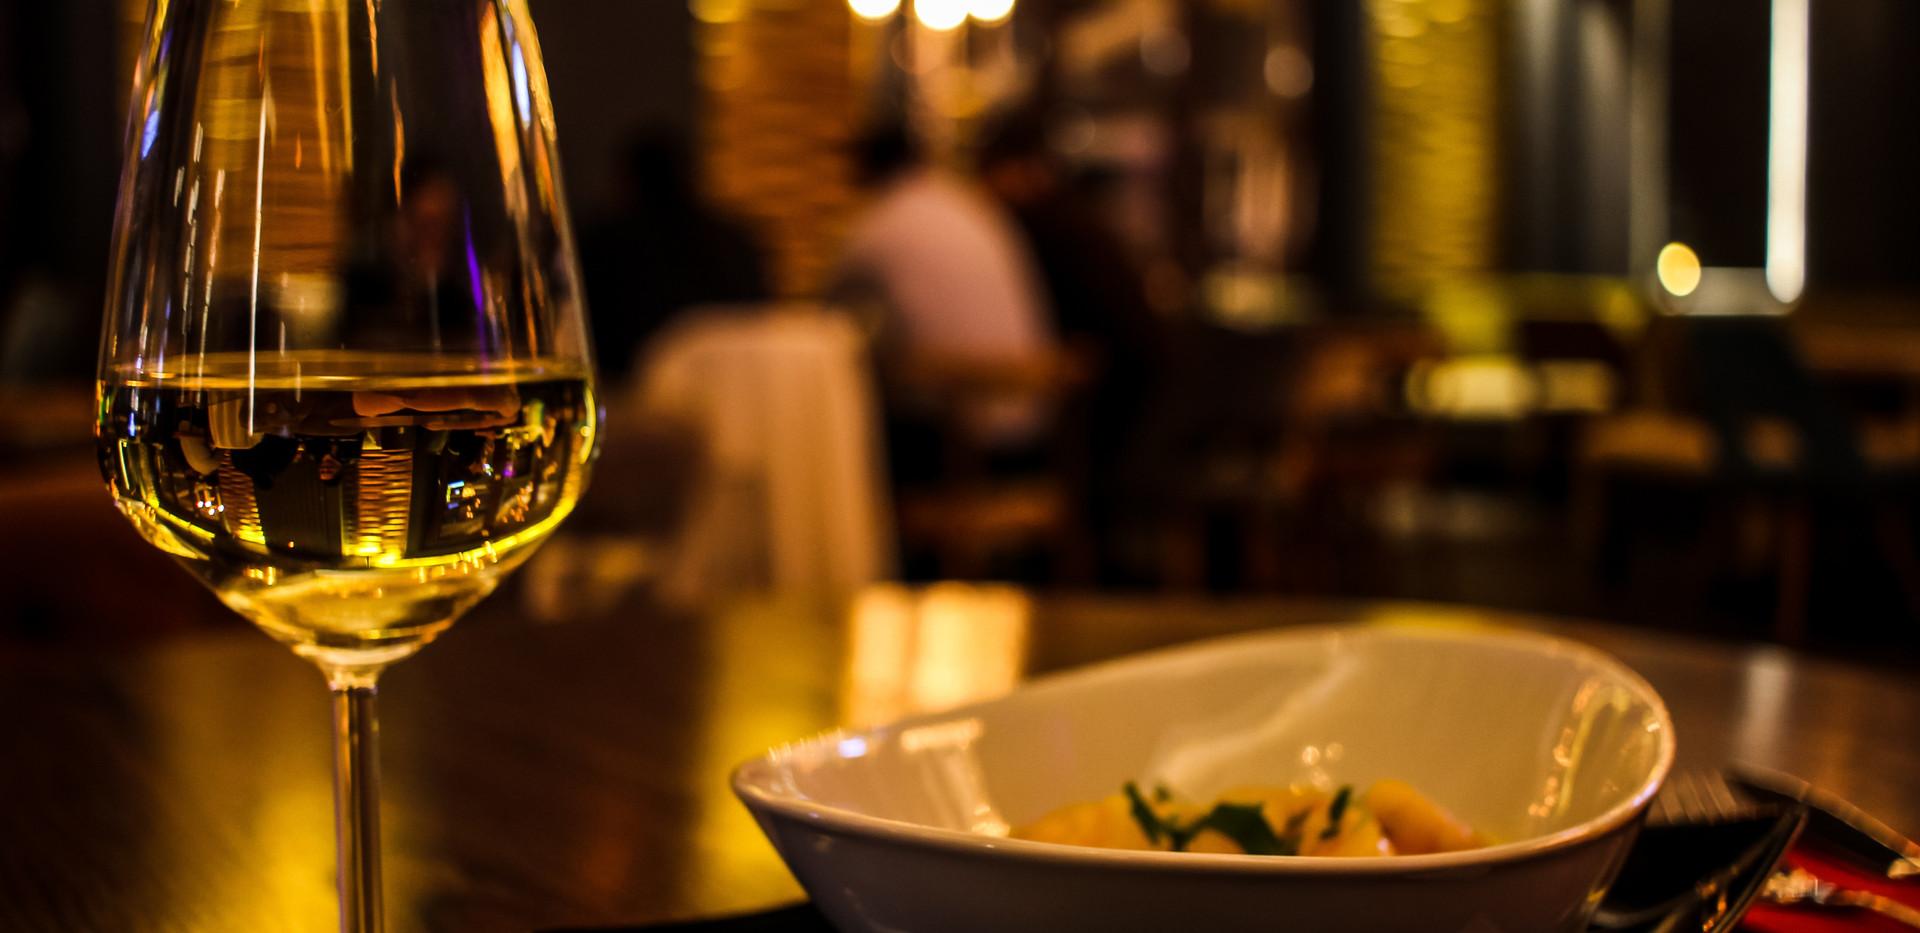 blur-close-up-cutlery-370984.jpg